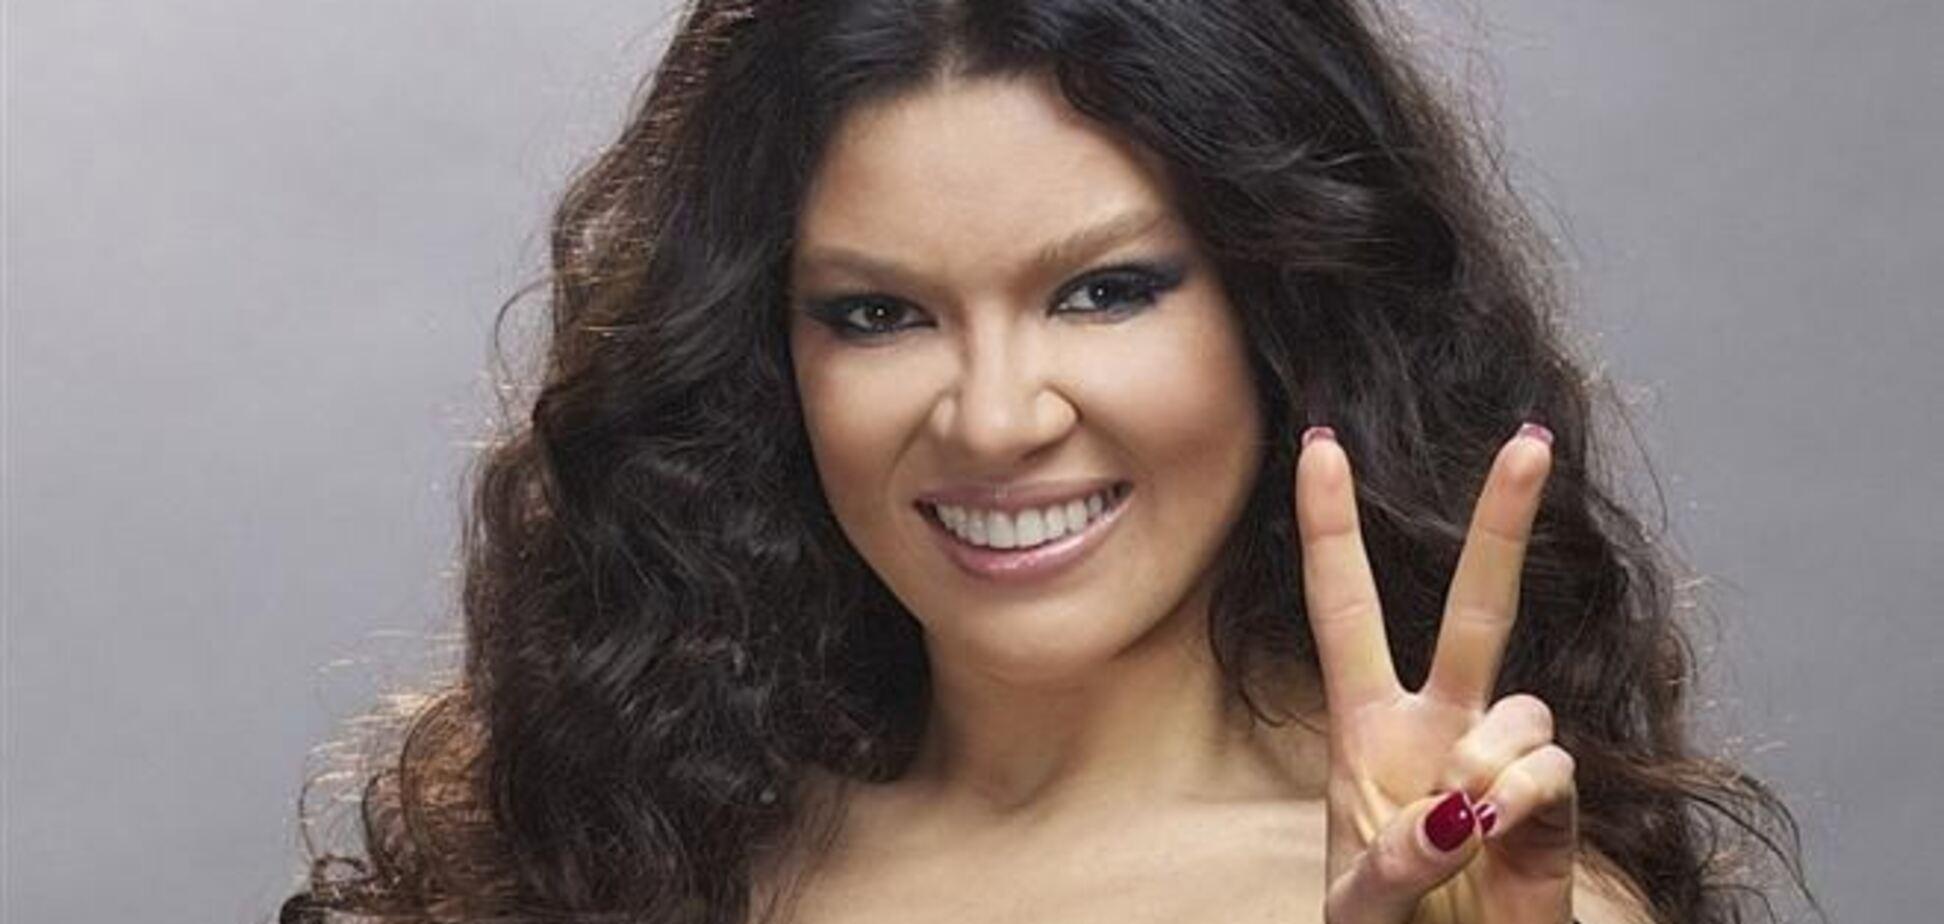 Певица Руслана объявила голодовку на Евромайдане